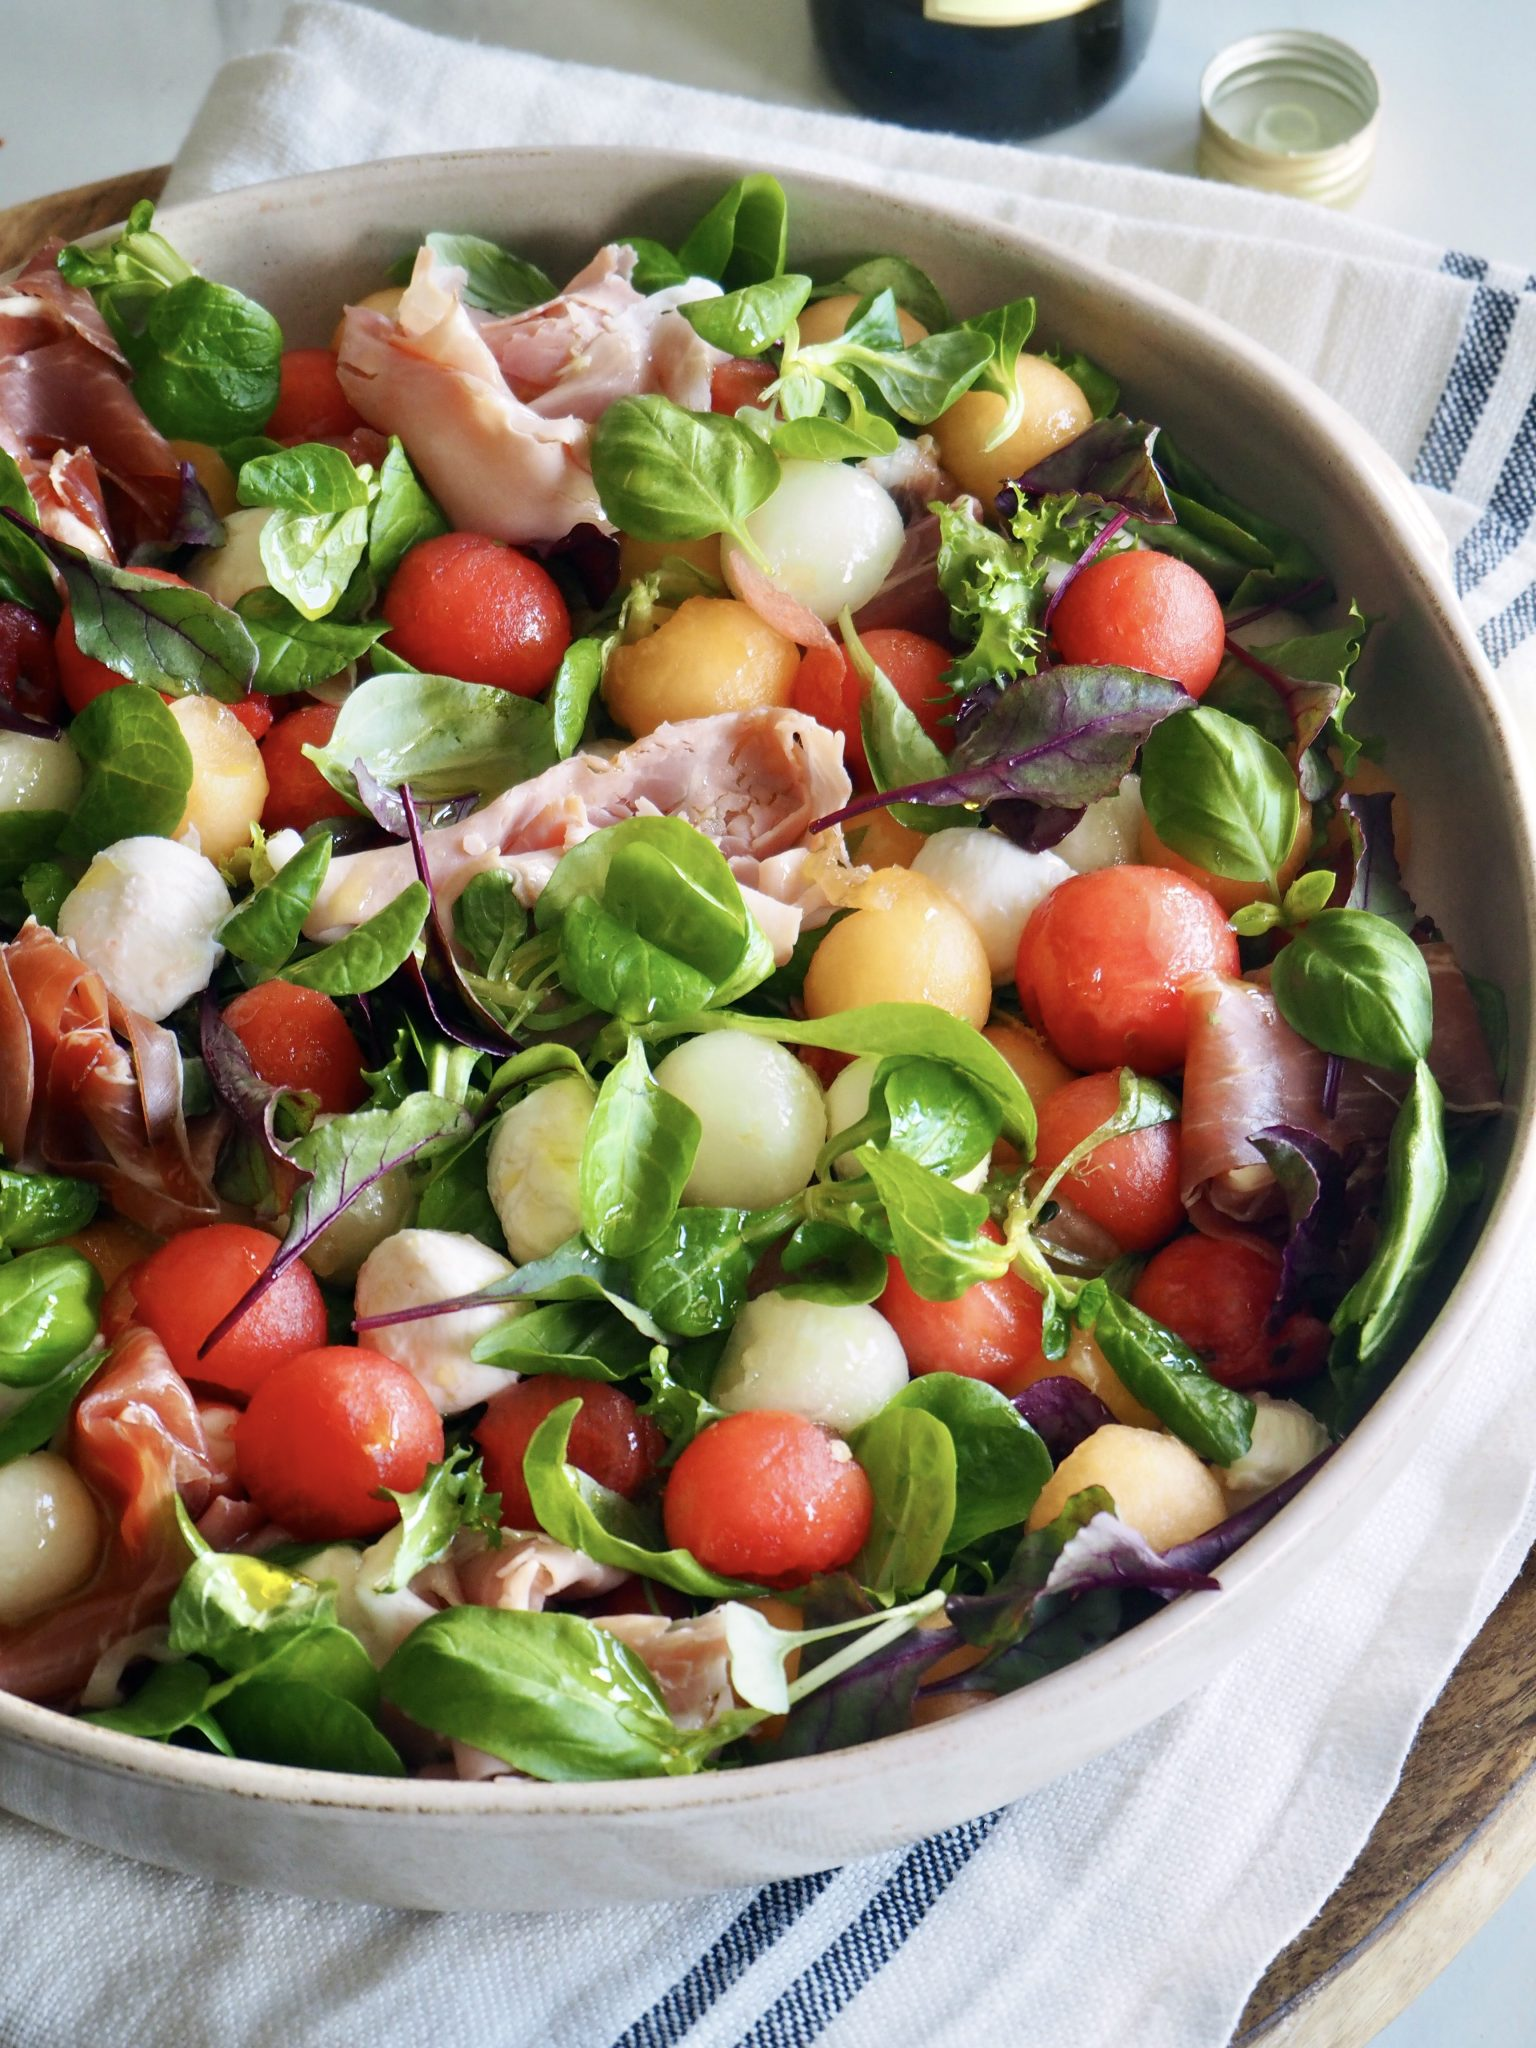 Fargerik salat med melon, mozzarella og skinker